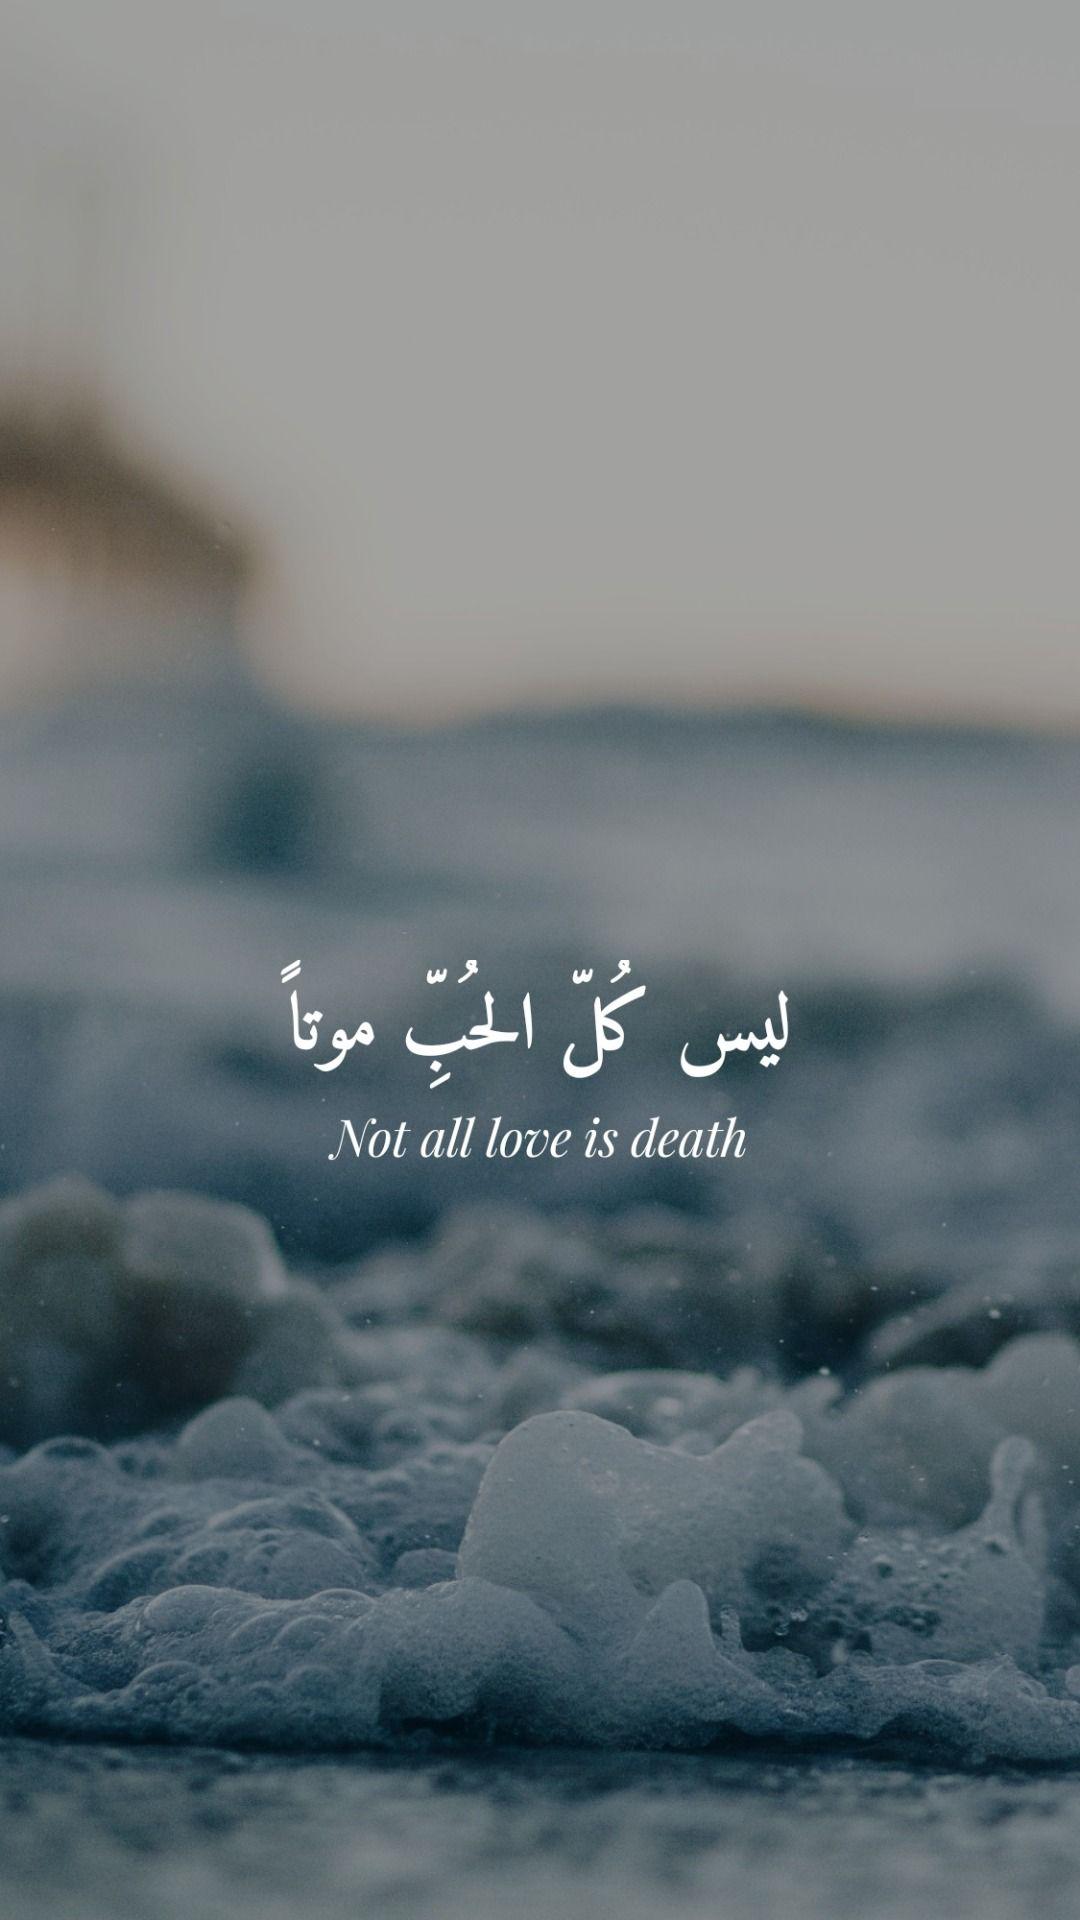 د ر ويش ي ات Instagram Stories Darwishism Tumblr Instagram Story Arabic Quotes Words